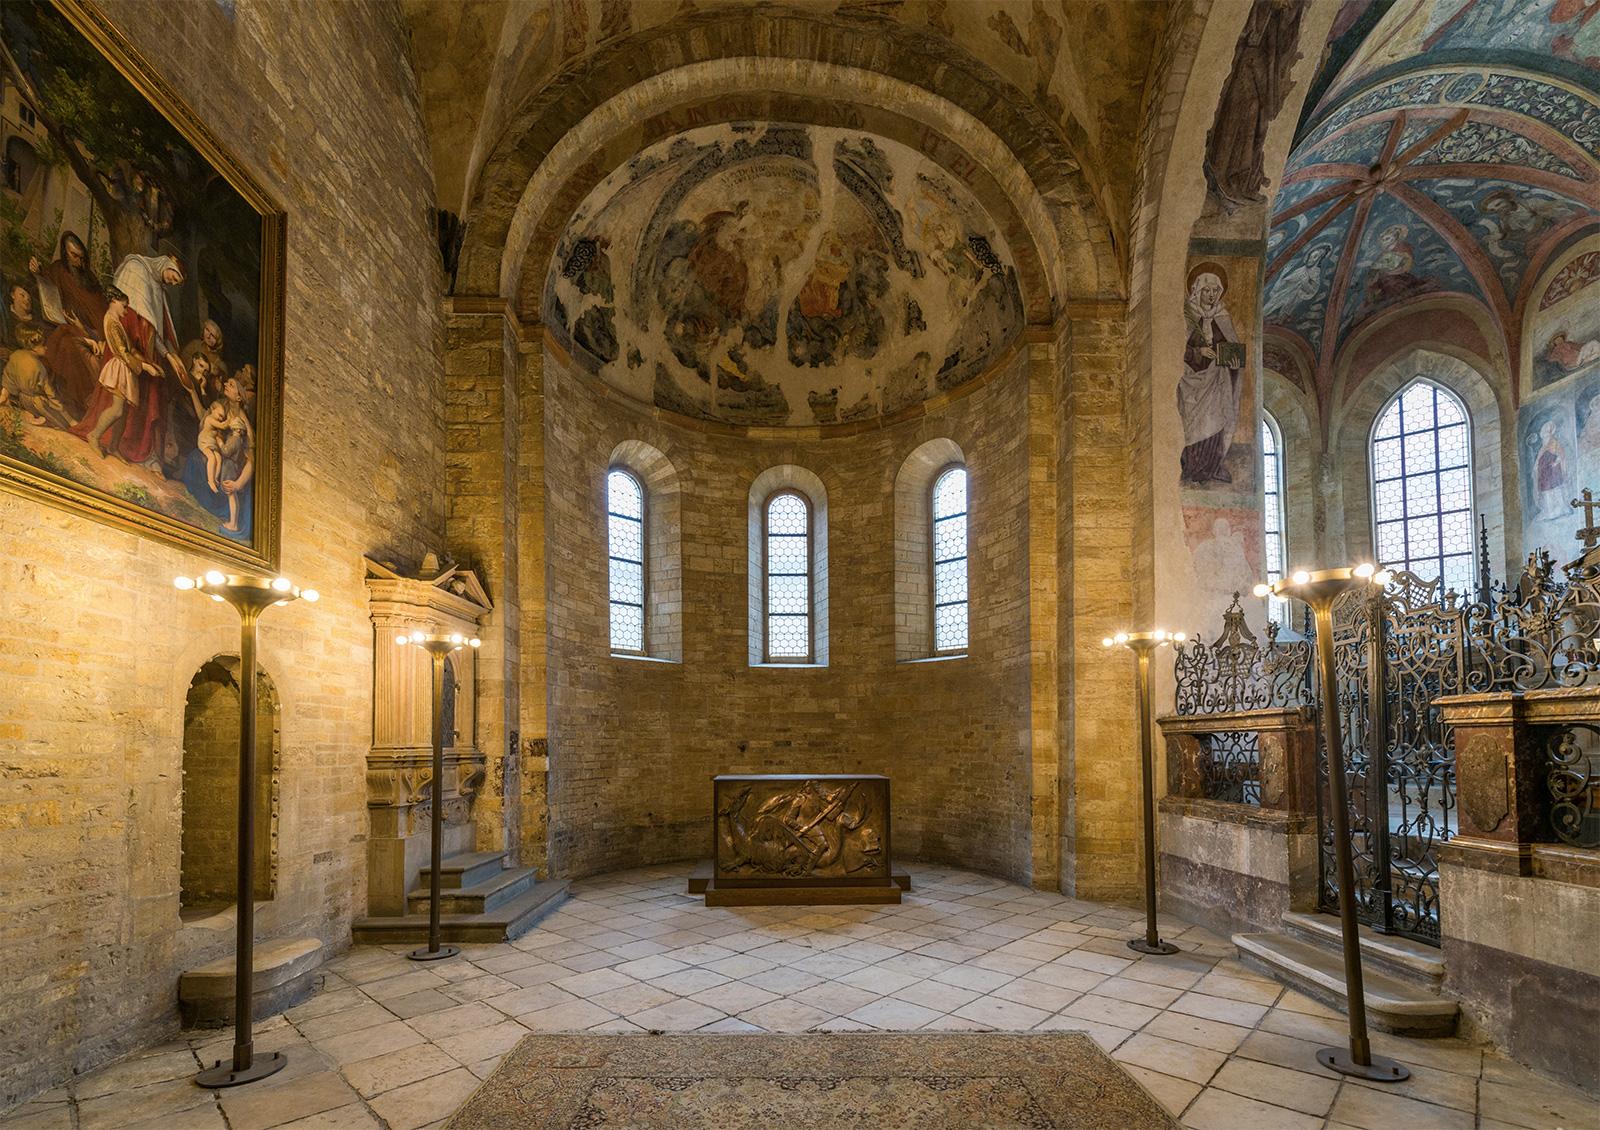 St George's Basilica interior